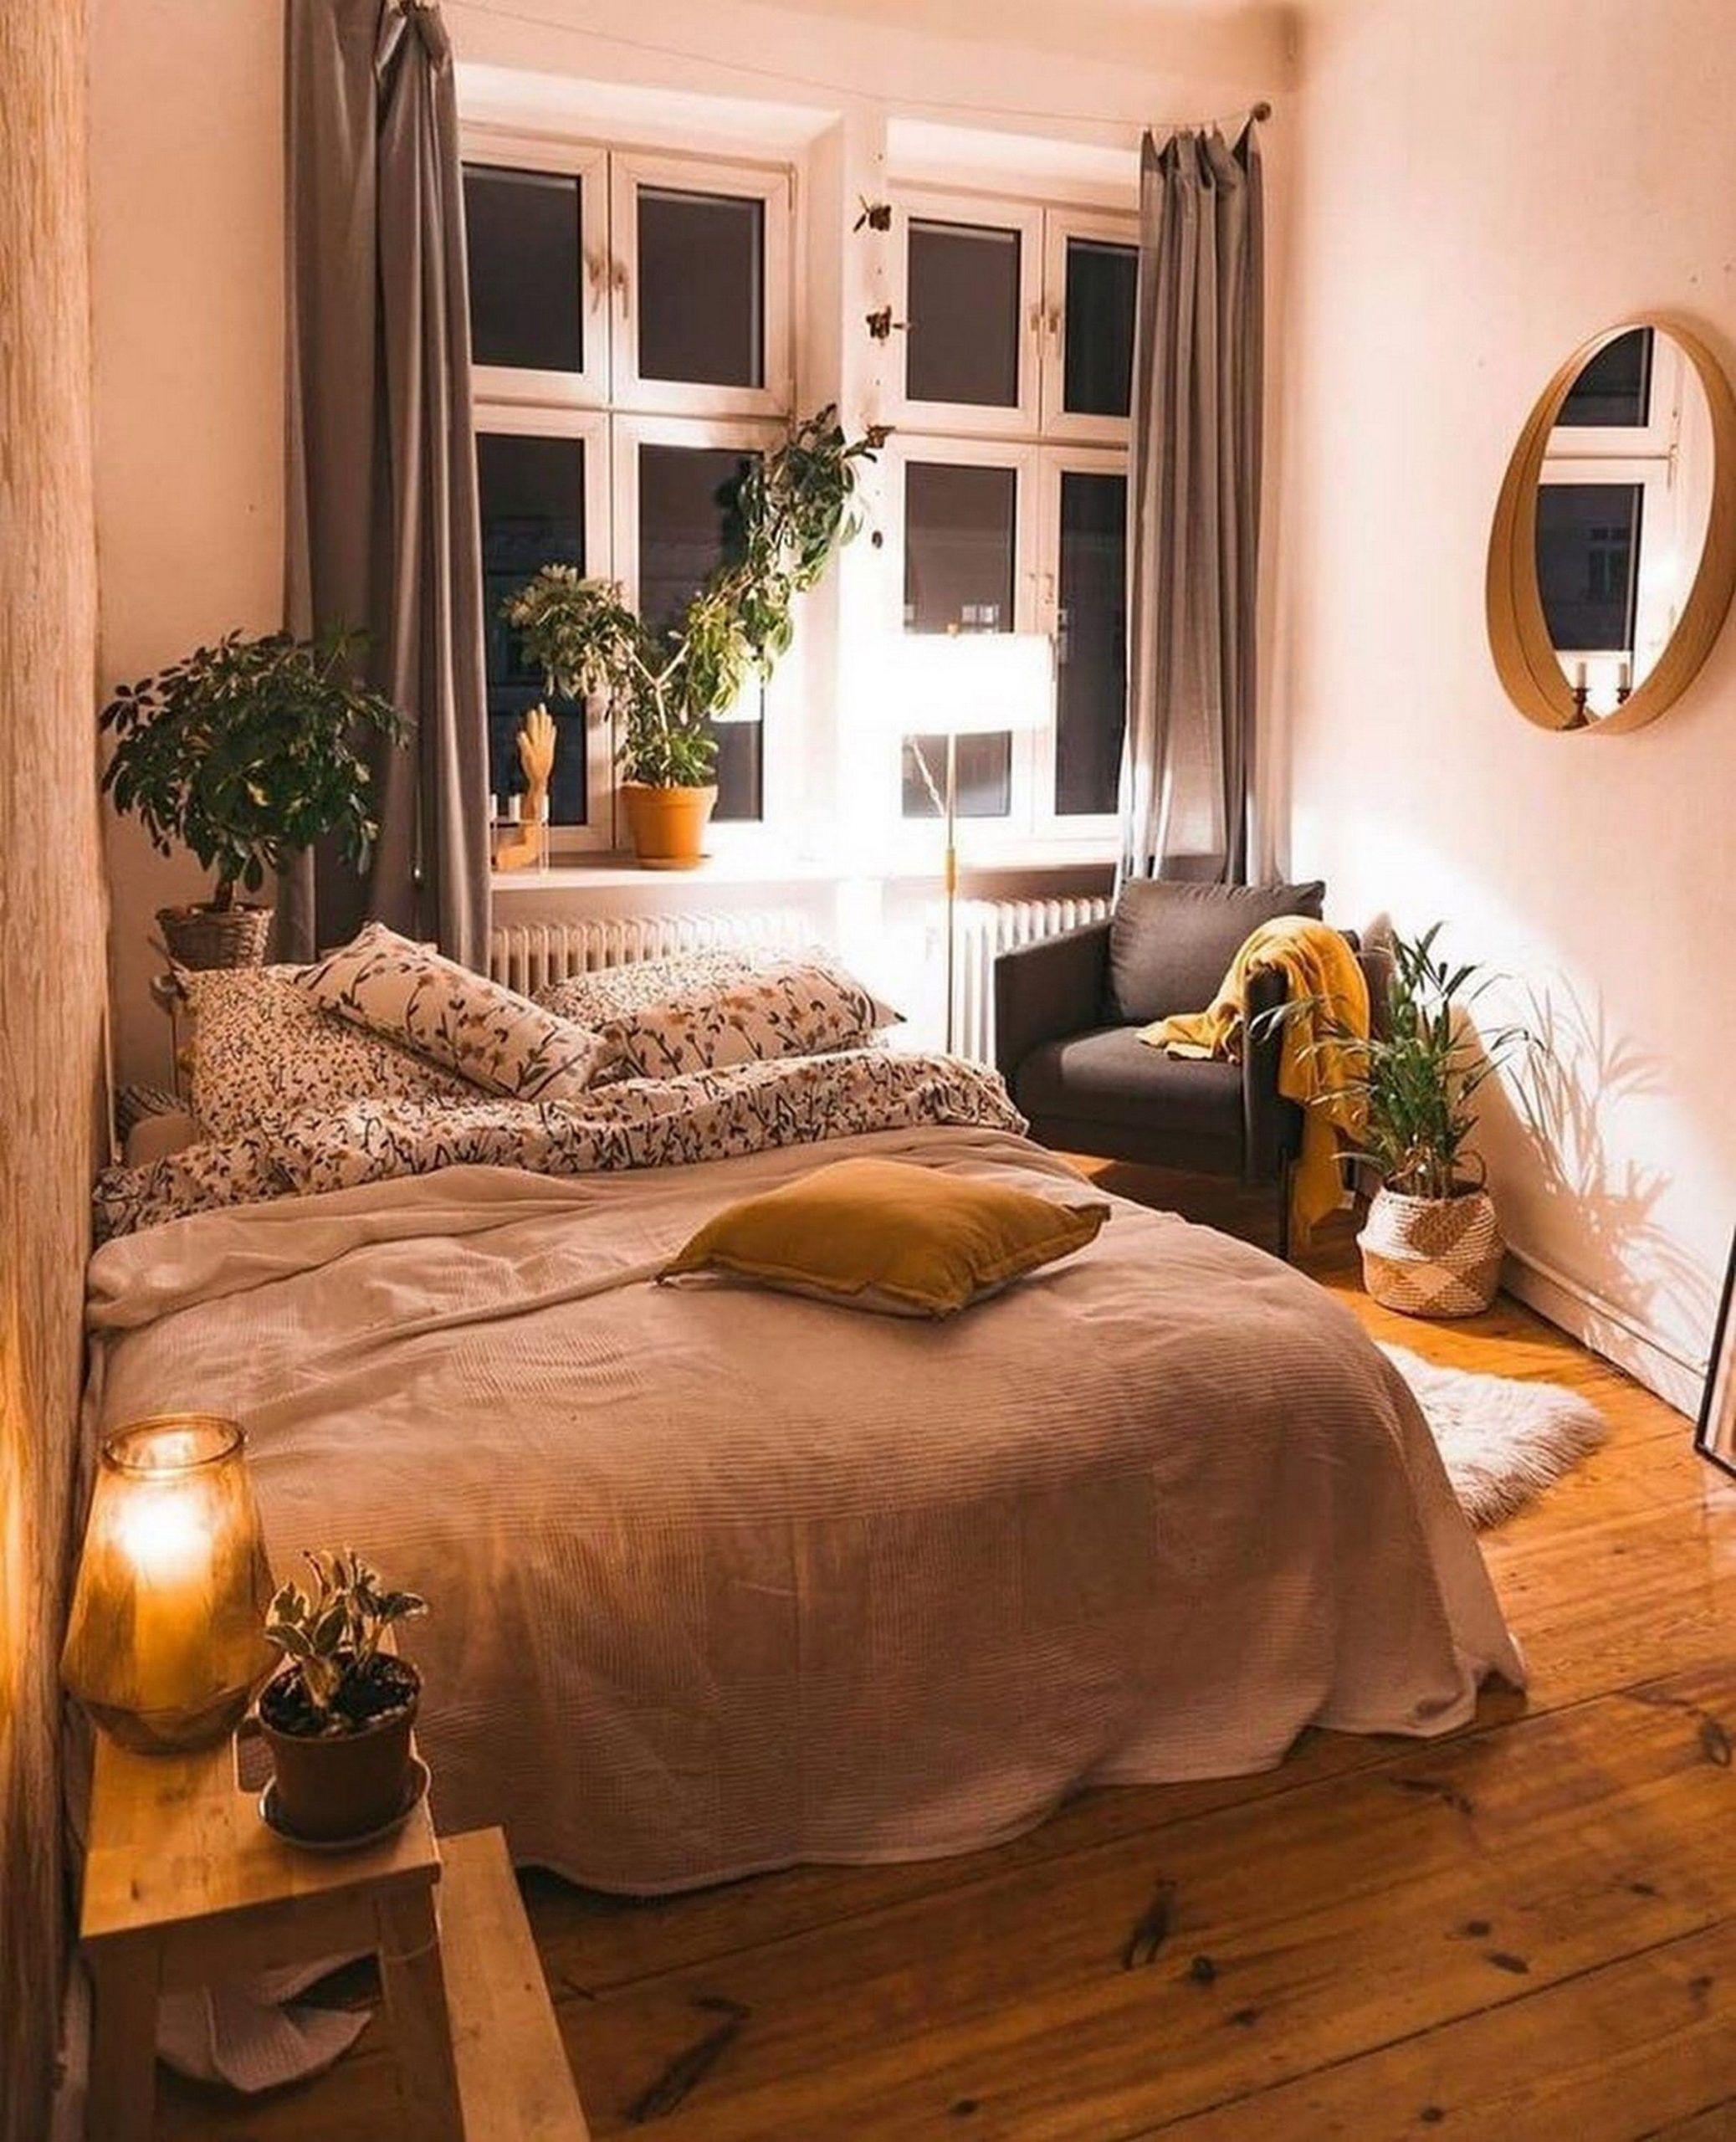 Bohemian Bedroom Decor – Home Decor - Modern